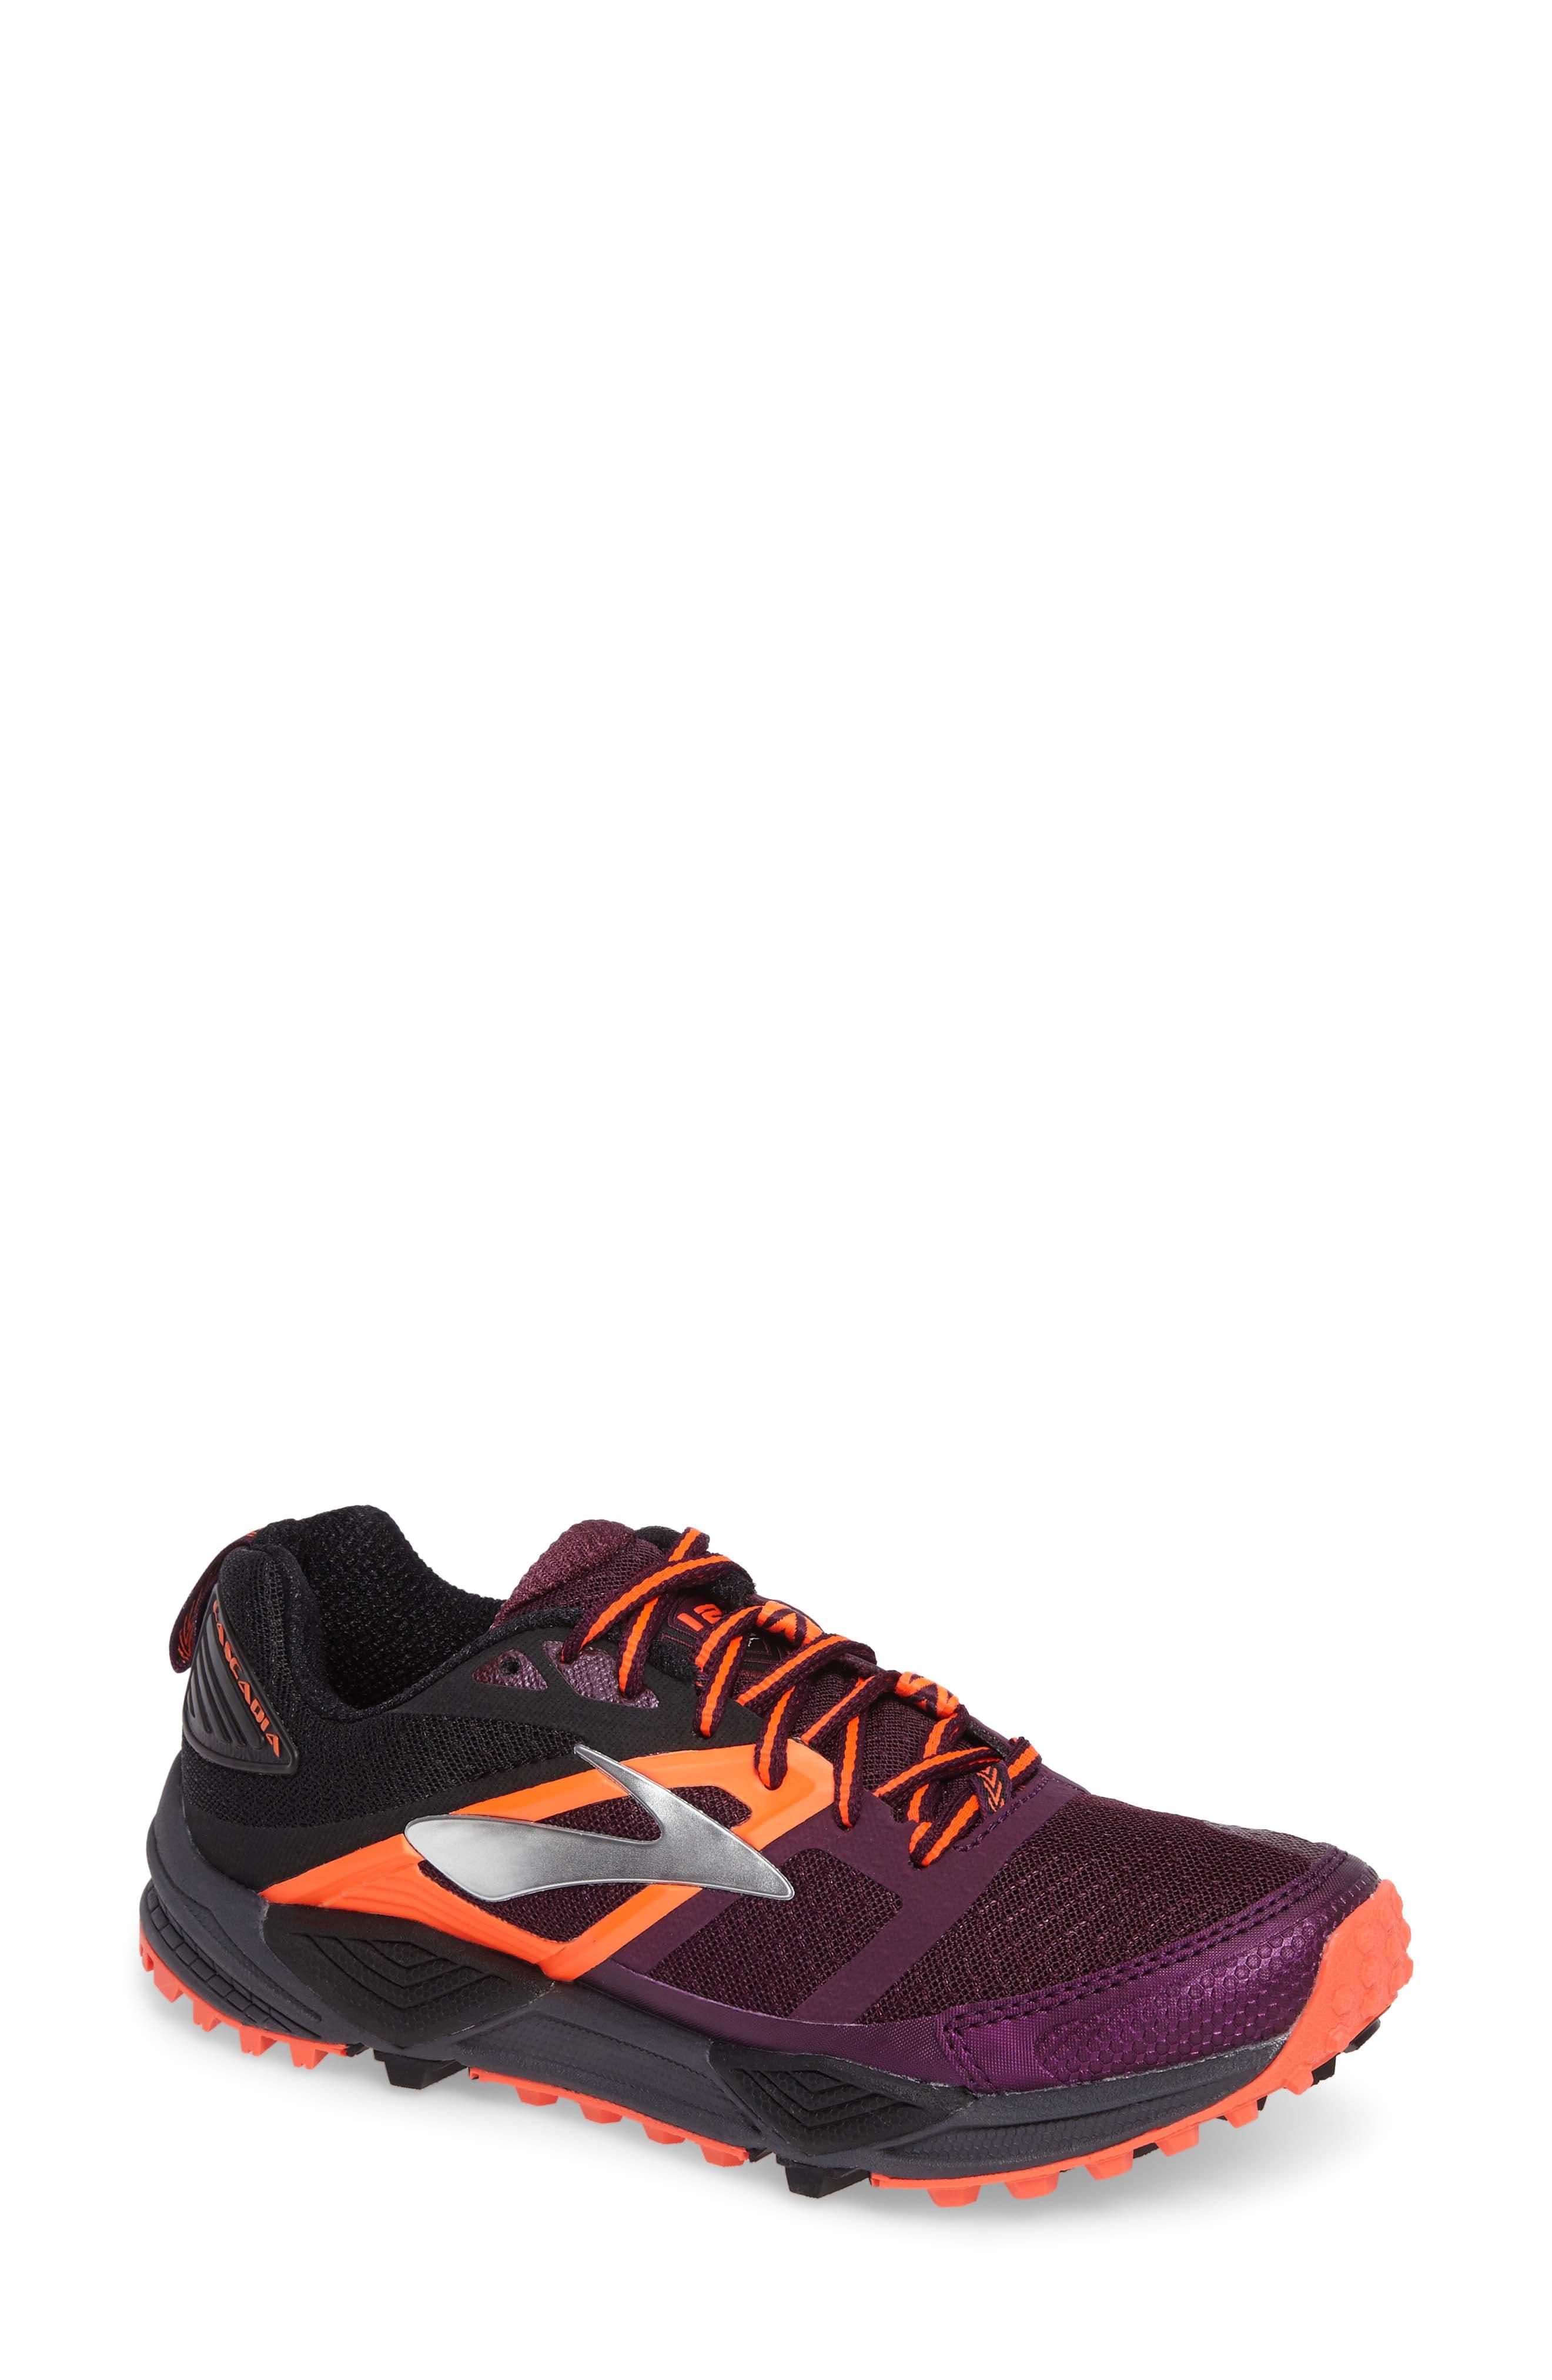 Alternate Image 1 Selected - Brooks Cascadia 12 Trail Running Shoe (Women)